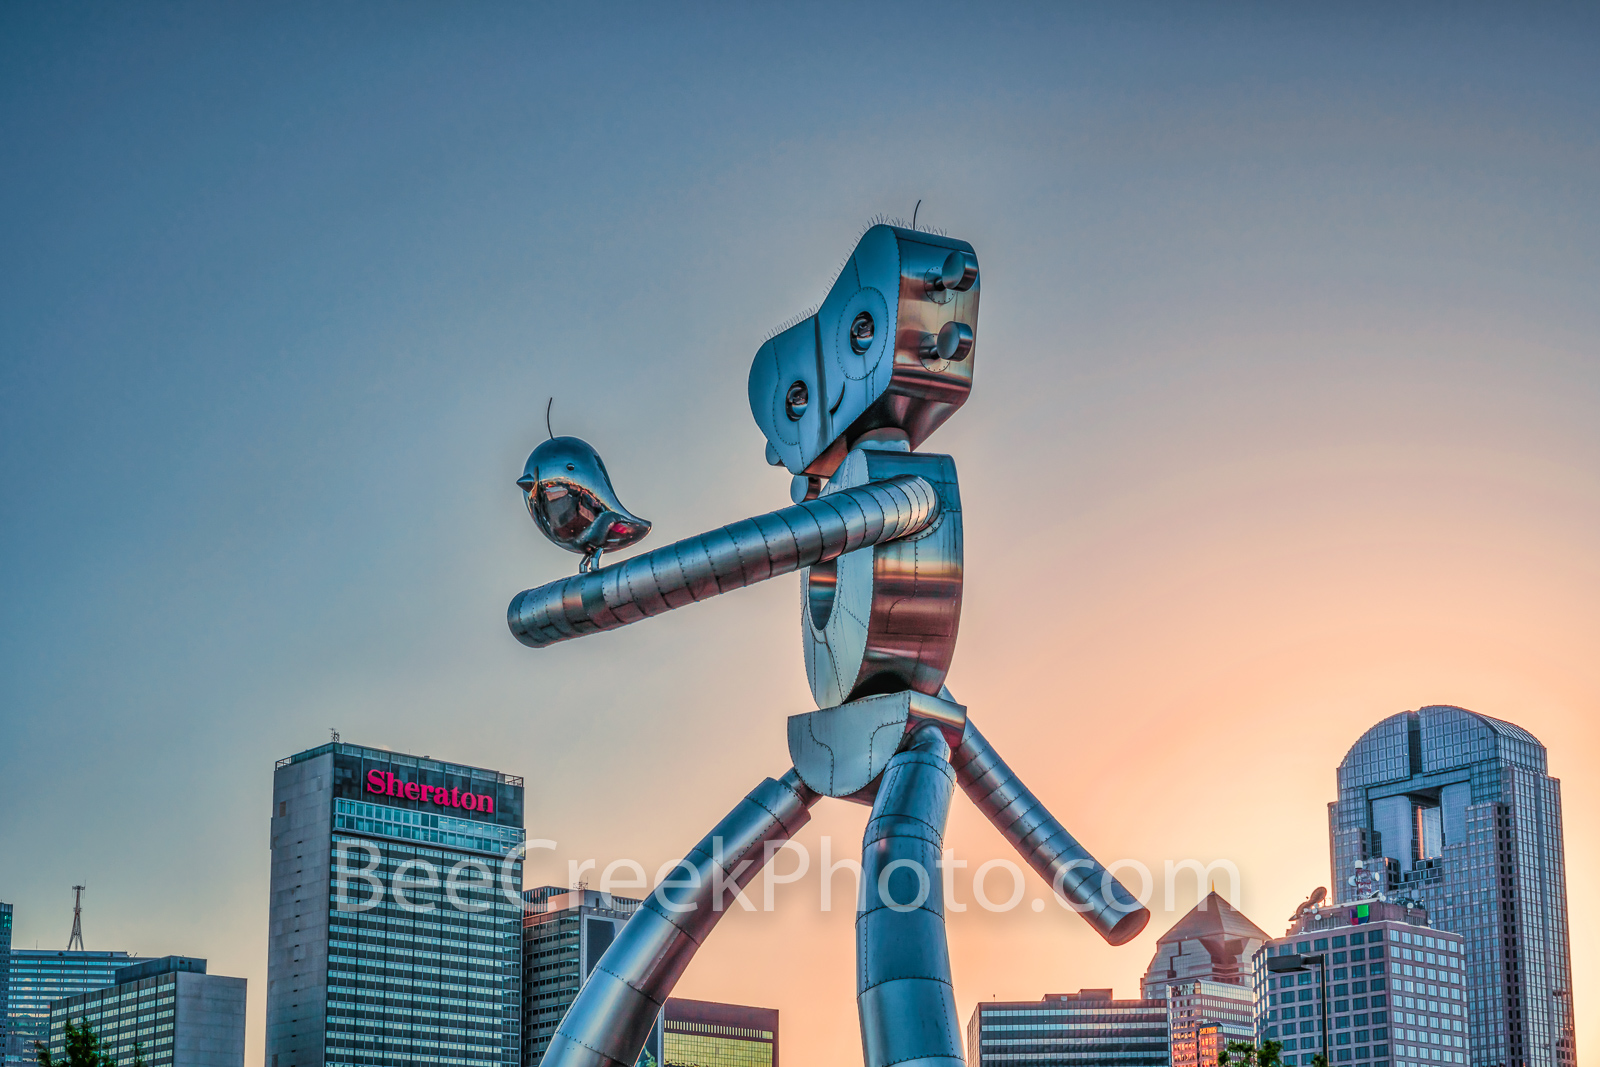 Dallas, traveling man, skyline, train, rail road, mass transit, scuplture, robot, strolling, bird, birds, Deep Ellum, cityscape, cityscapes, day, images of dallas, photos of dallas, pictures of dallas, photo